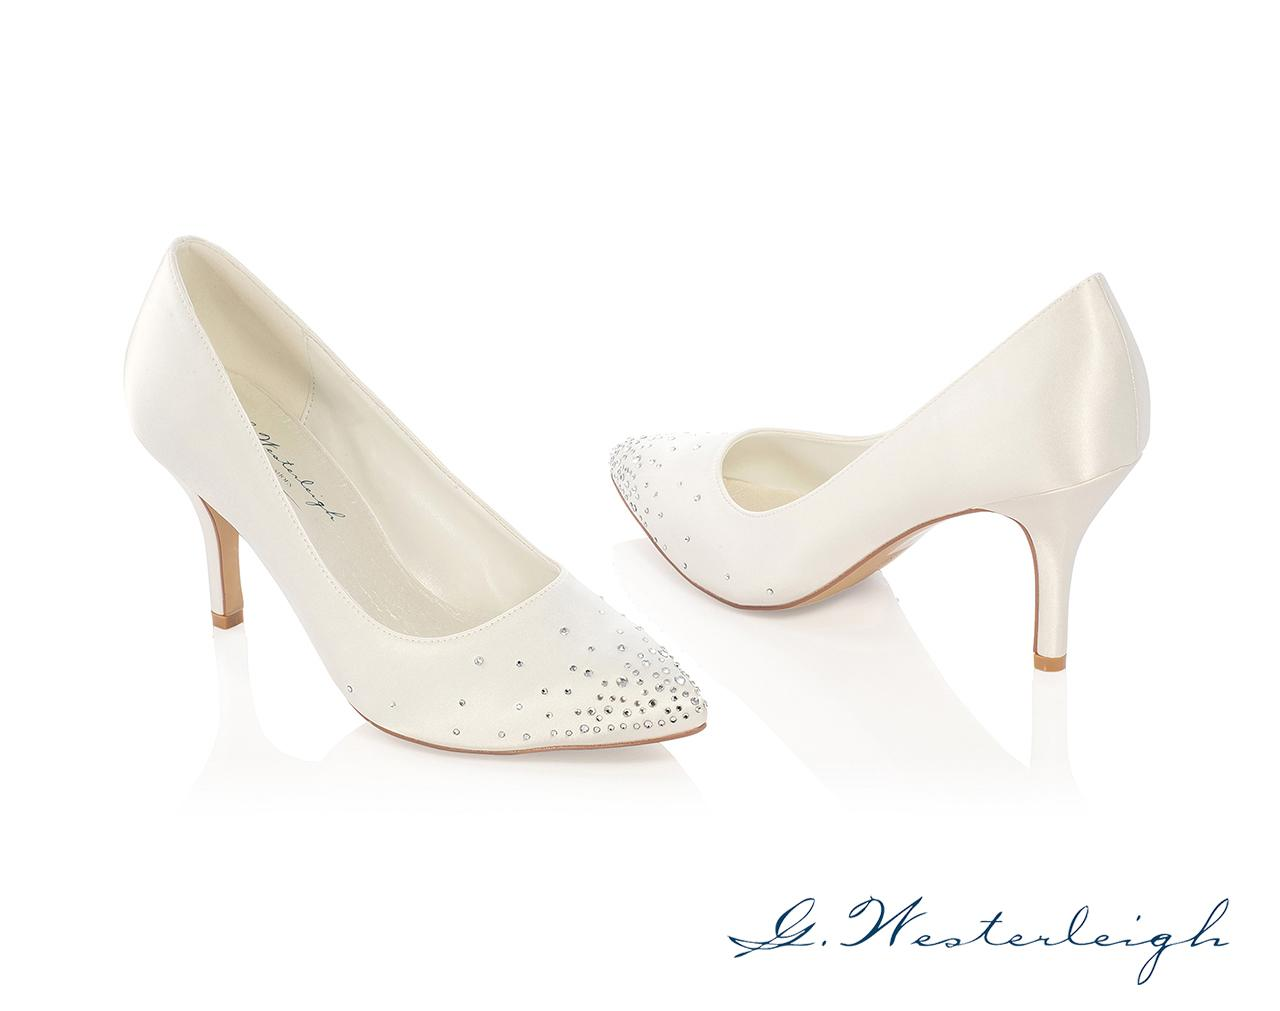 GEMMA - Westerleigh cipő. 22.900 Ft. 8 cm sarok